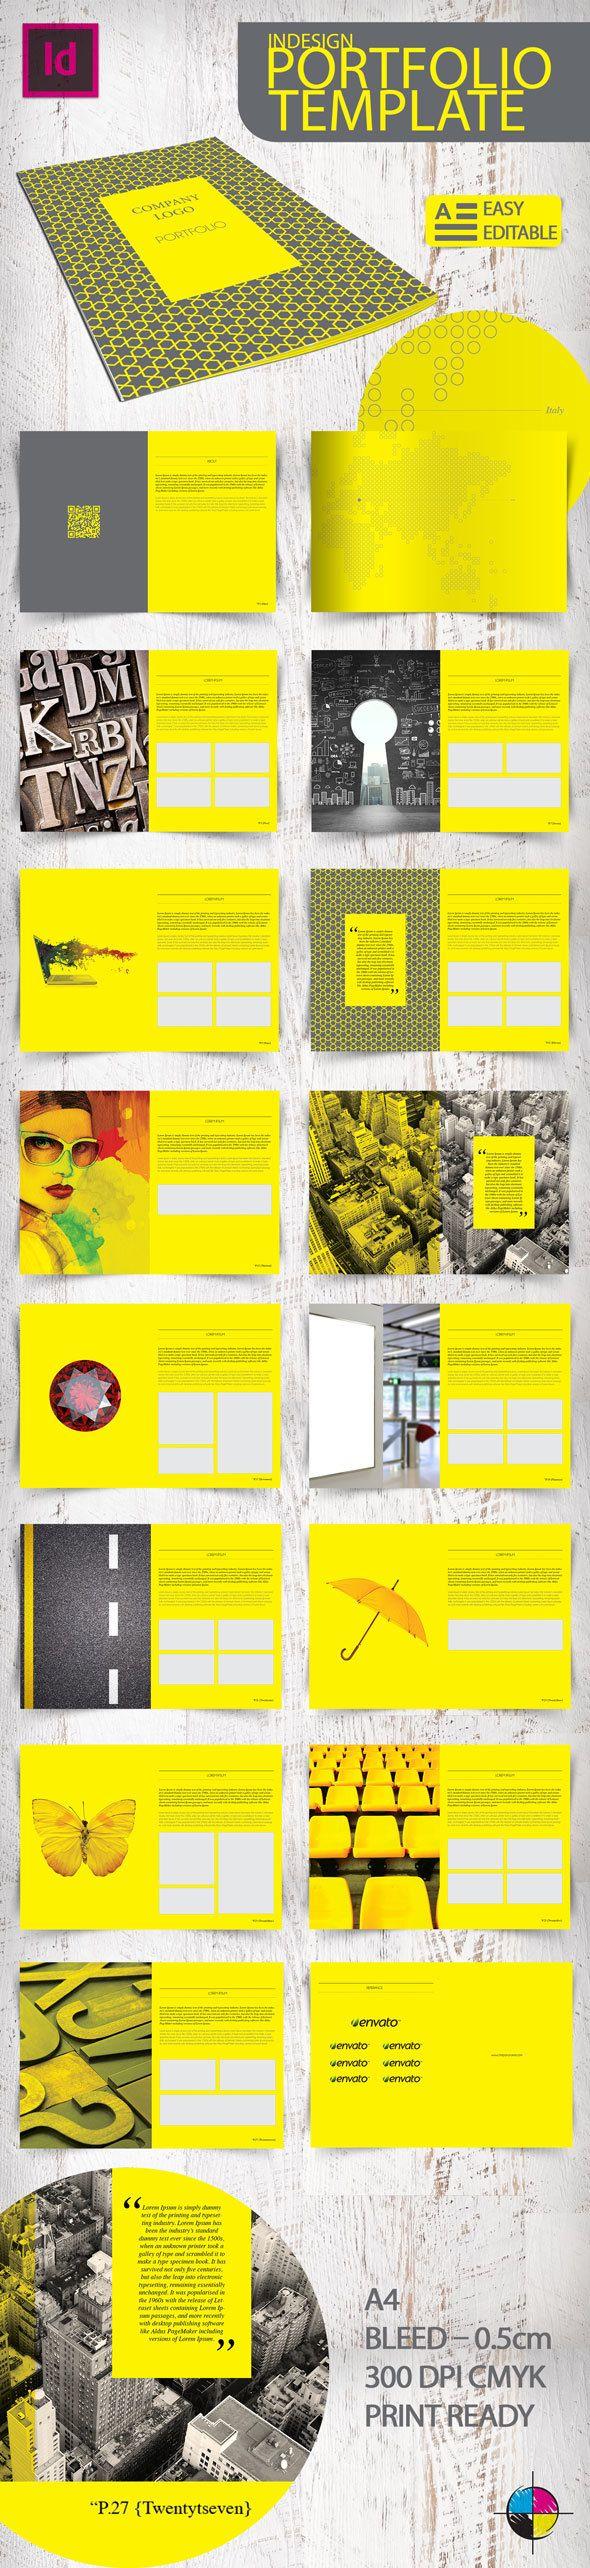 Indesign Portfolio Template by Erdem Ozkan, via Behance